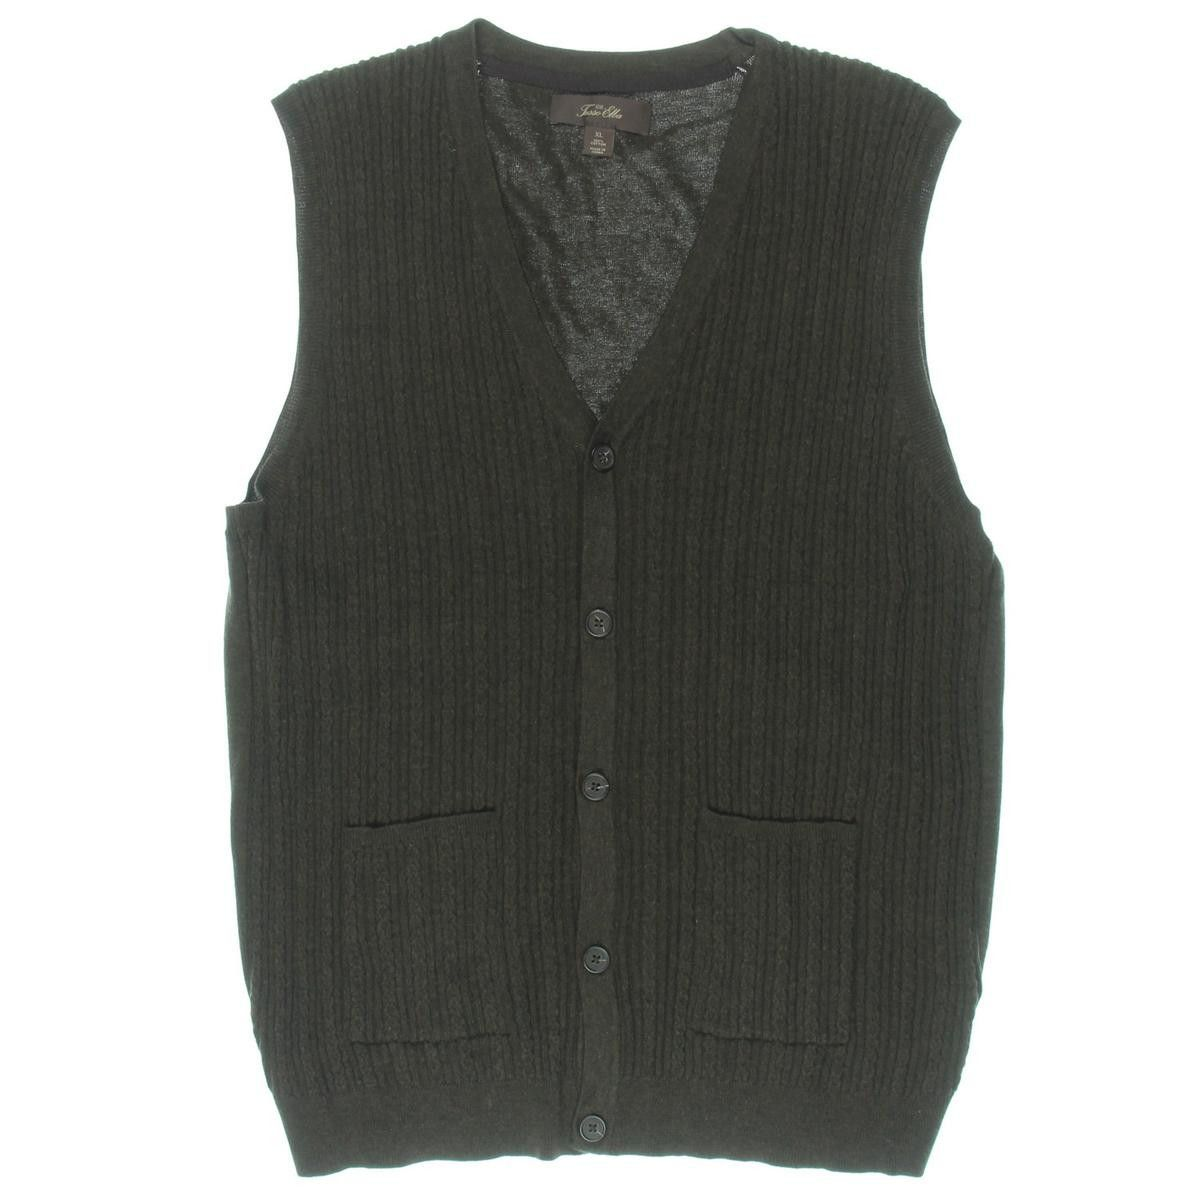 Tasso Elba Mens Cable Knit Button Front Sweater Vest Sweater Vests